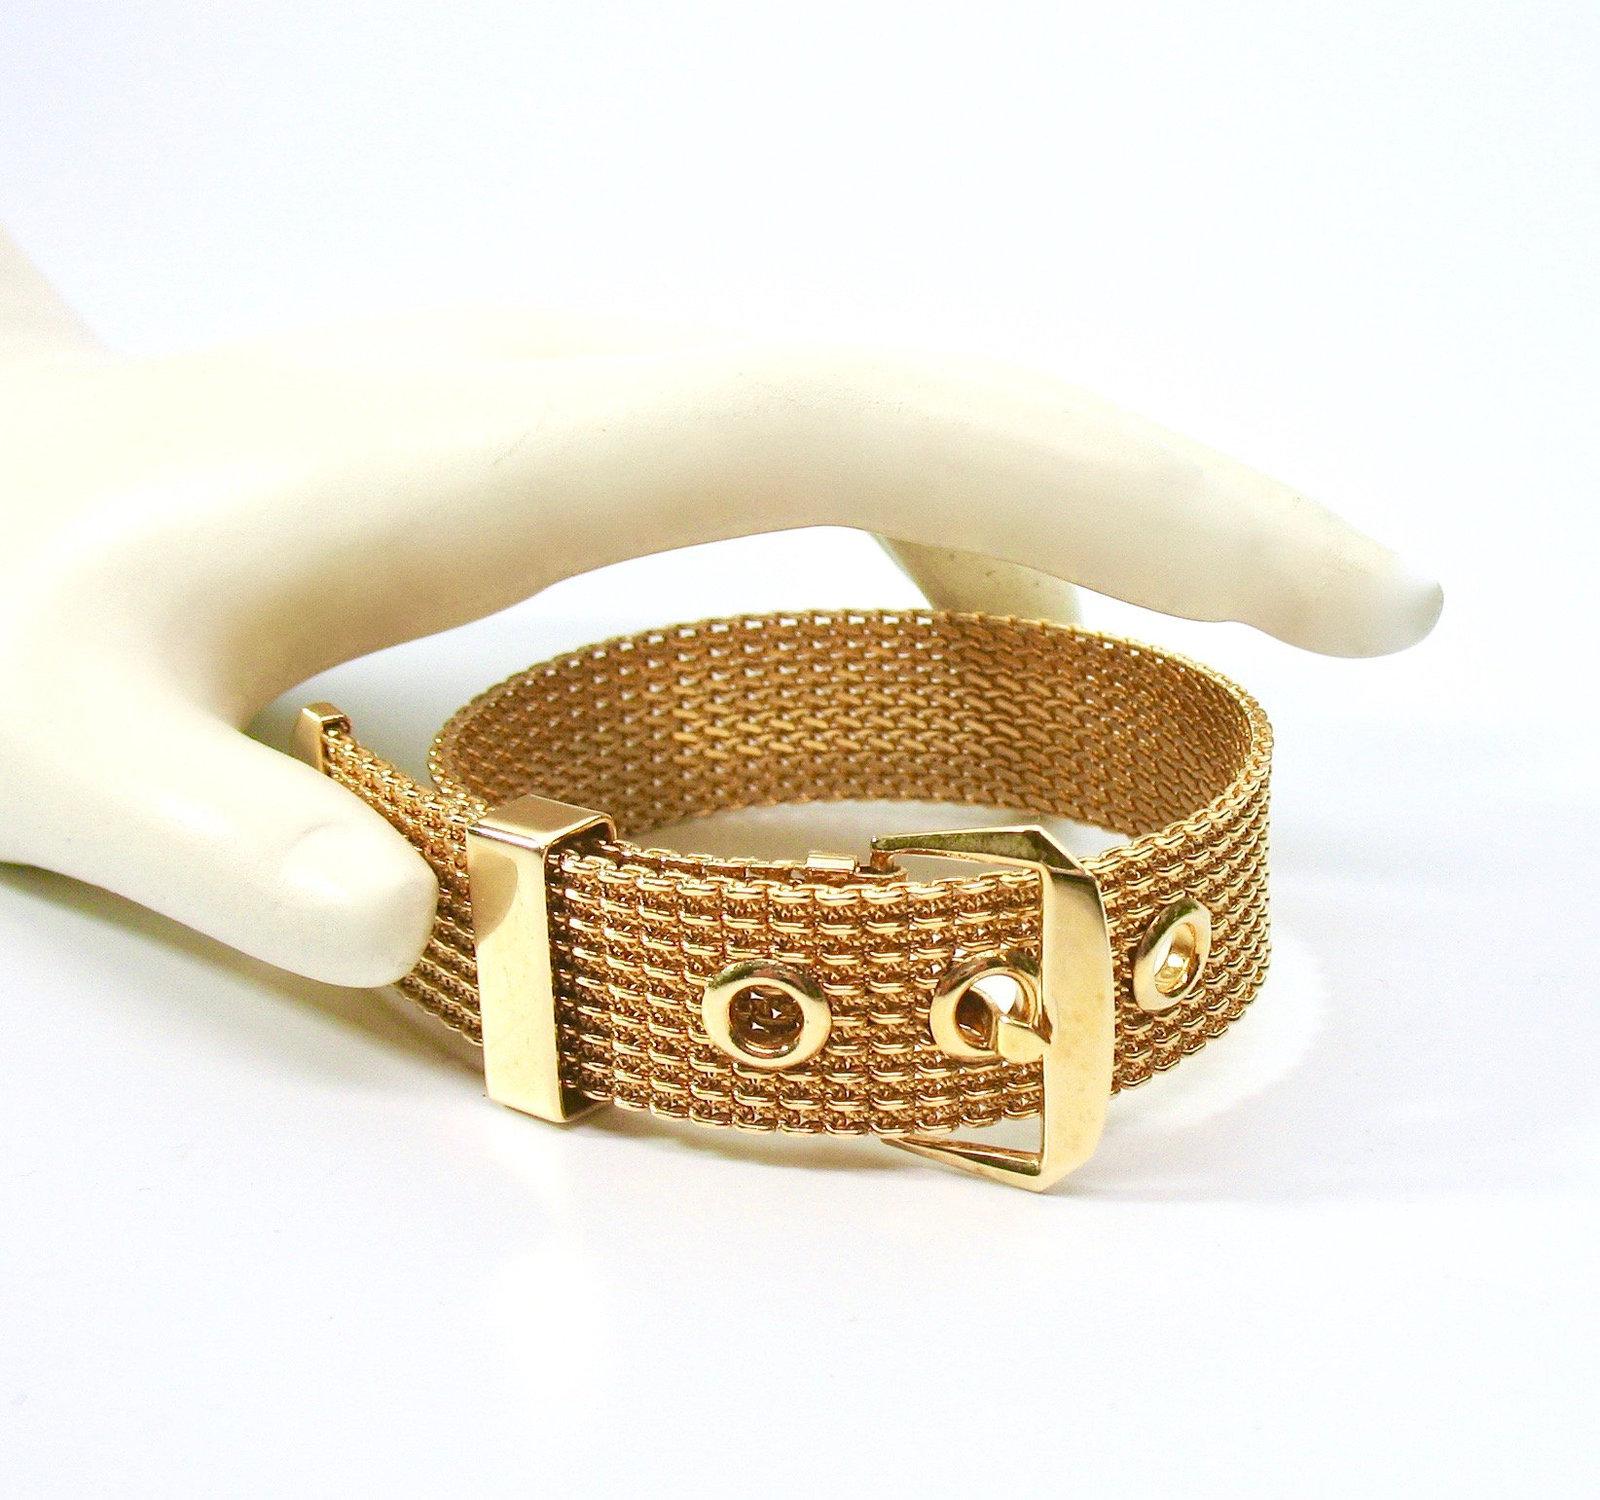 Mesh Buckle Bracelet, Gold Tone, Avon, 1970's, Adjustable, Signed Collectible, D - $24.00